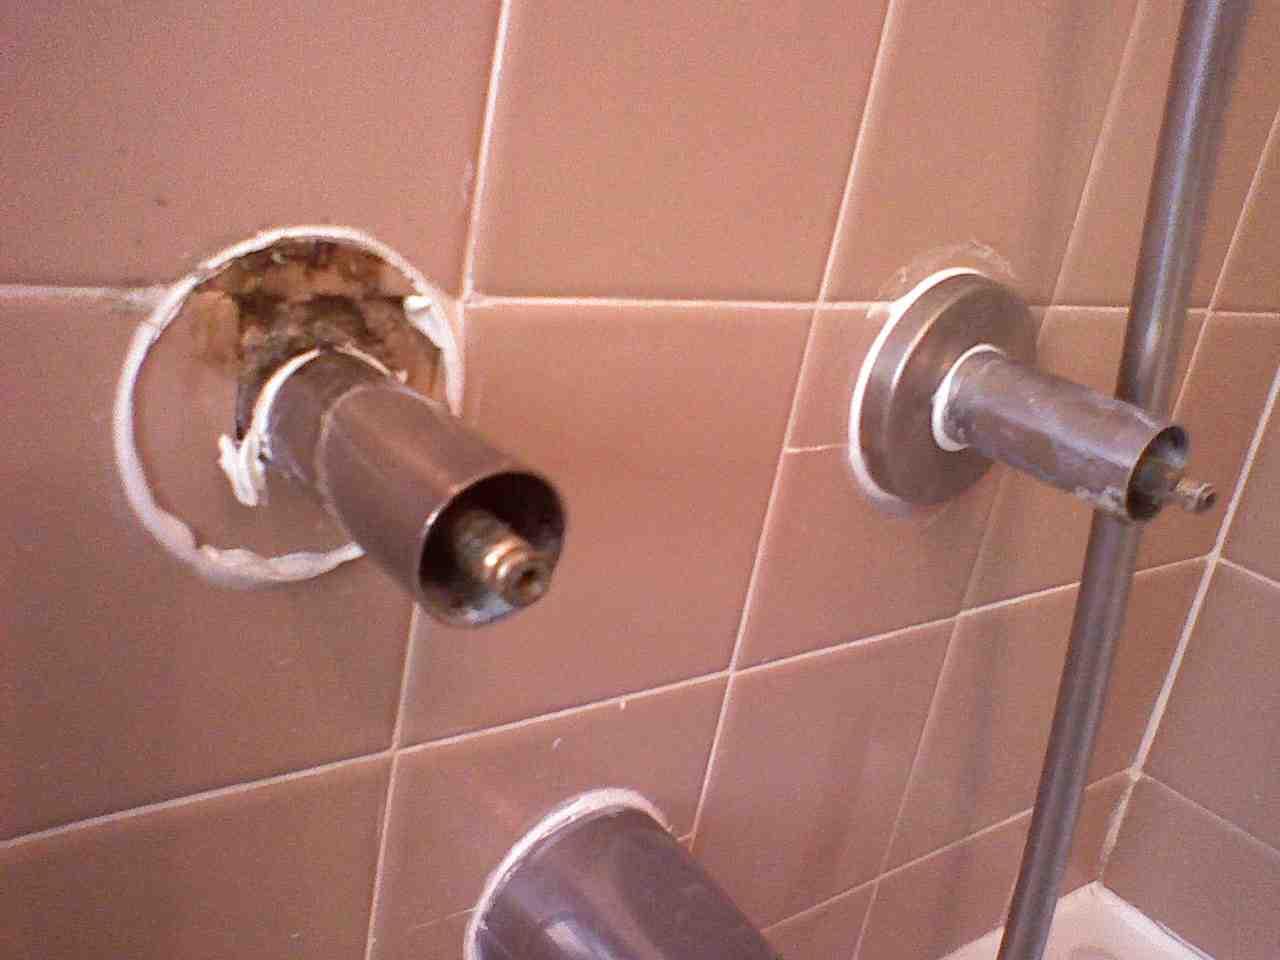 Can\'t reach Valve stem nut | Terry Love Plumbing & Remodel DIY ...